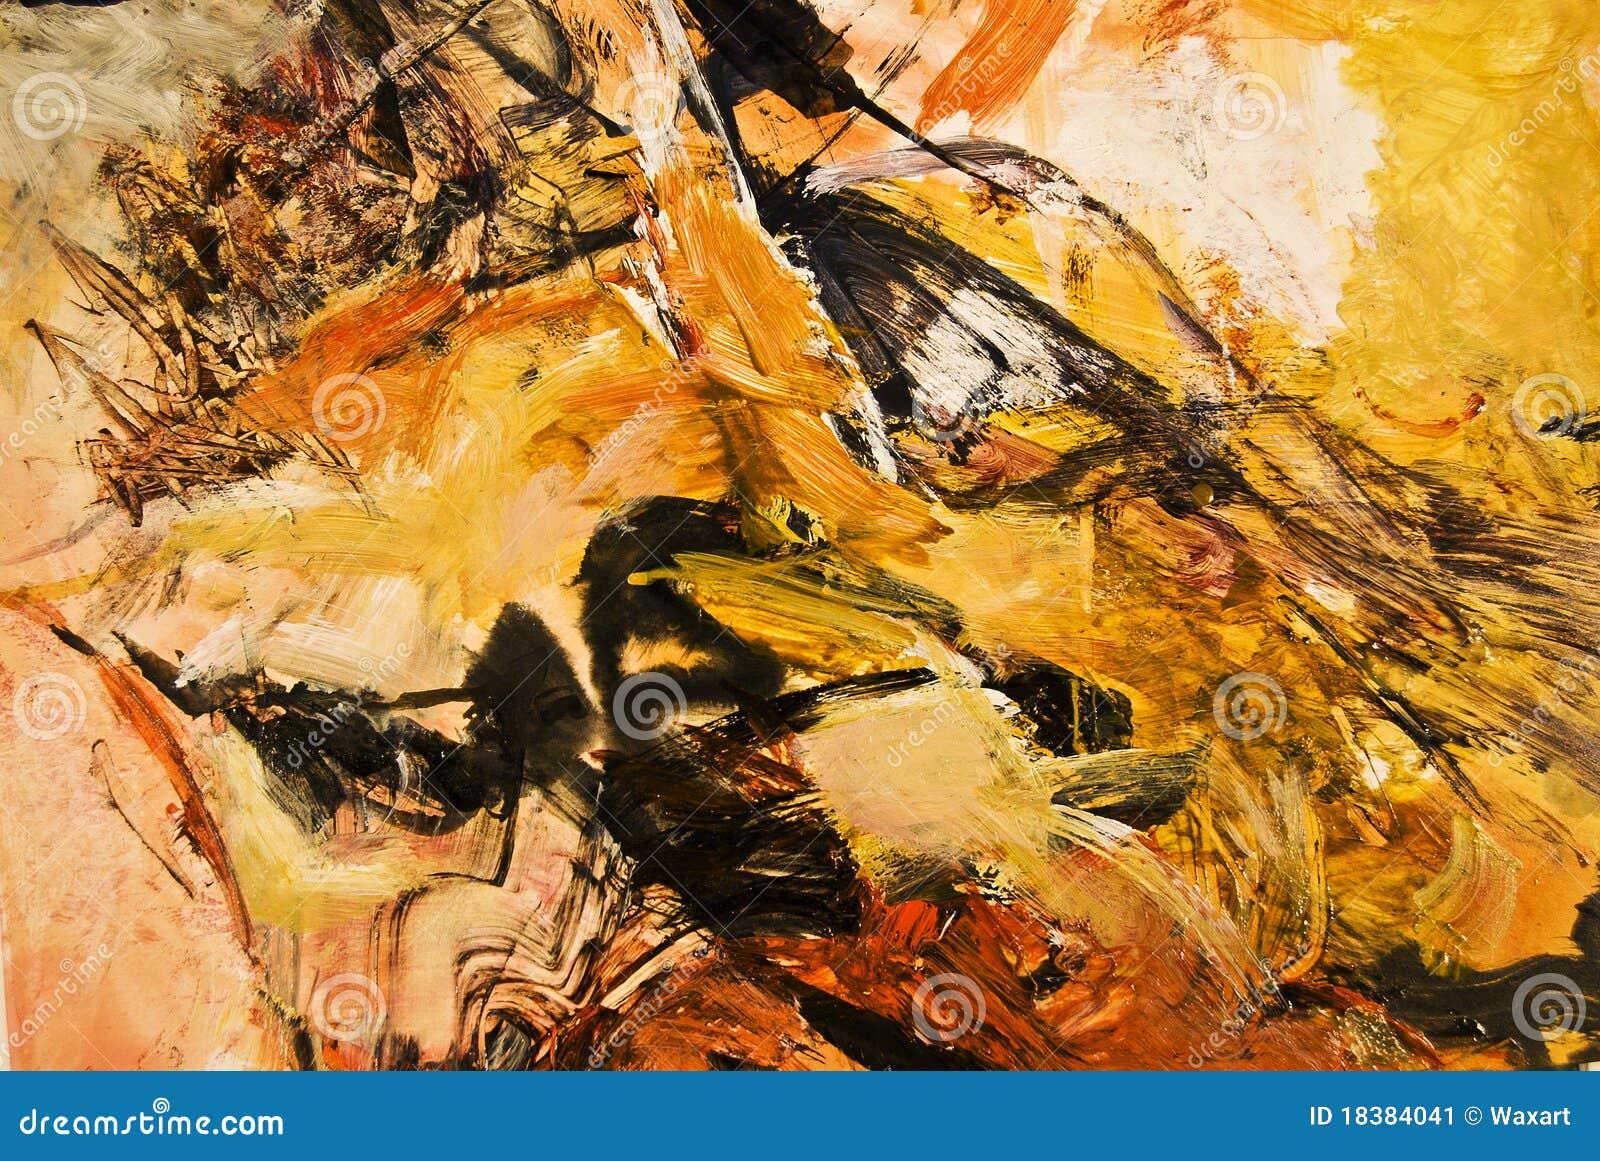 Animal Acrylic Painting